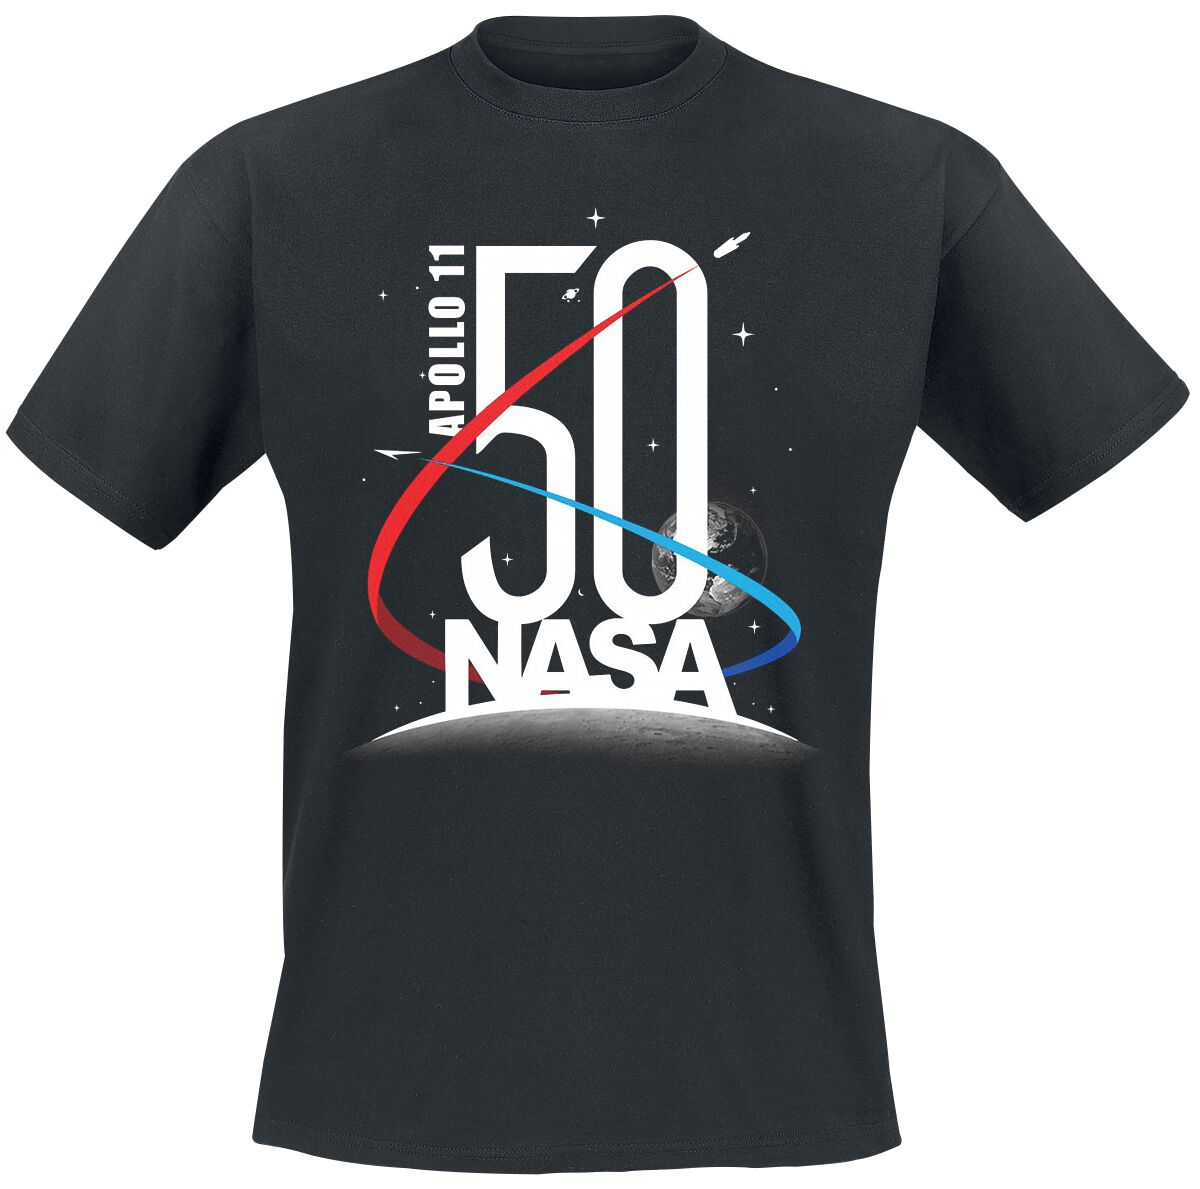 Nasa Apollo 11-50eme Anniversaire T-Shirt Manches Courtes Noir